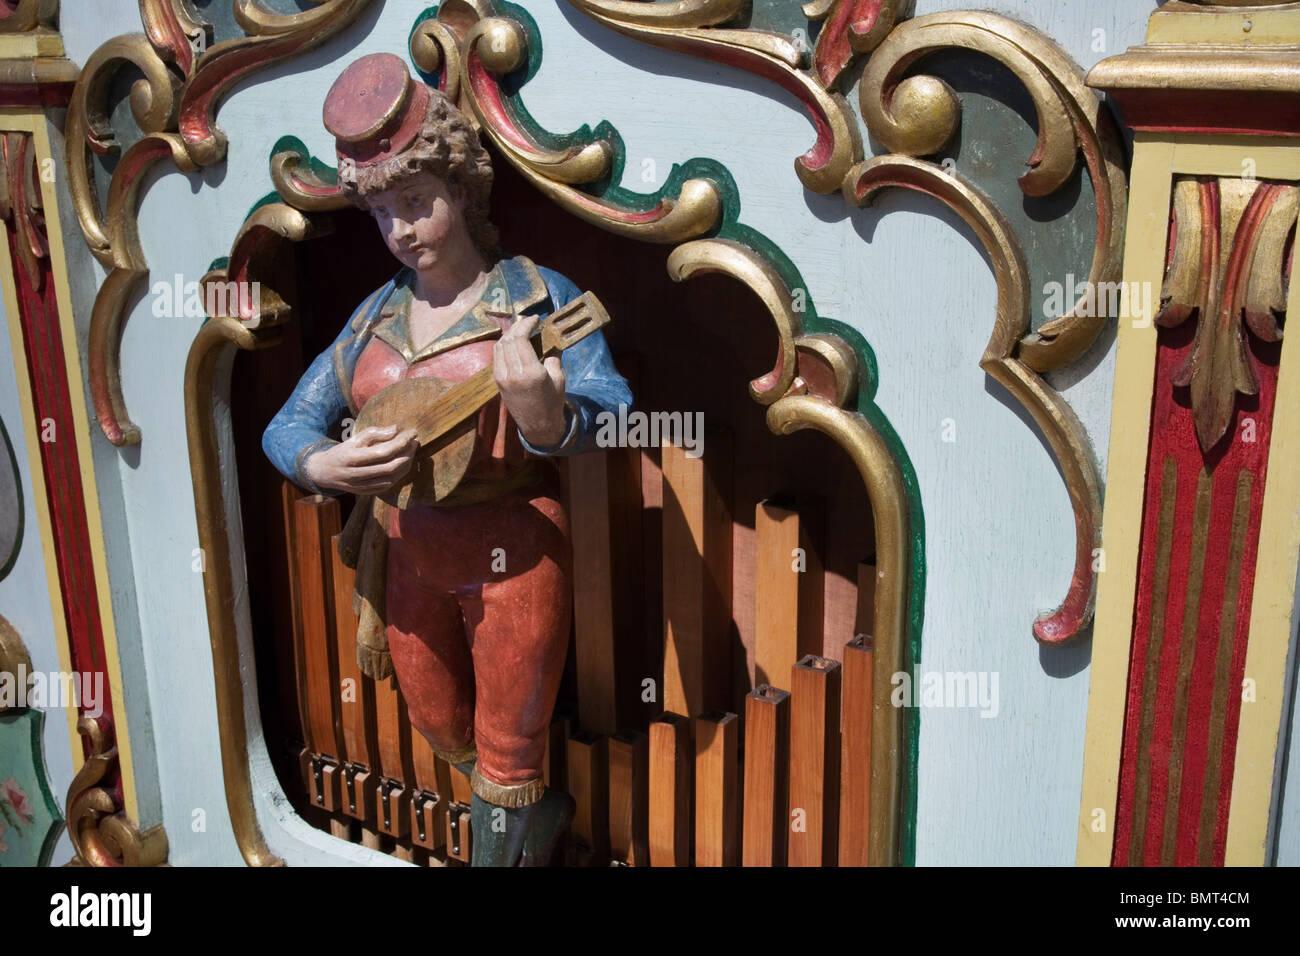 Vintage organ Starkton White front orchestrion or Noteorgel, Vienna, Austria - Stock Image